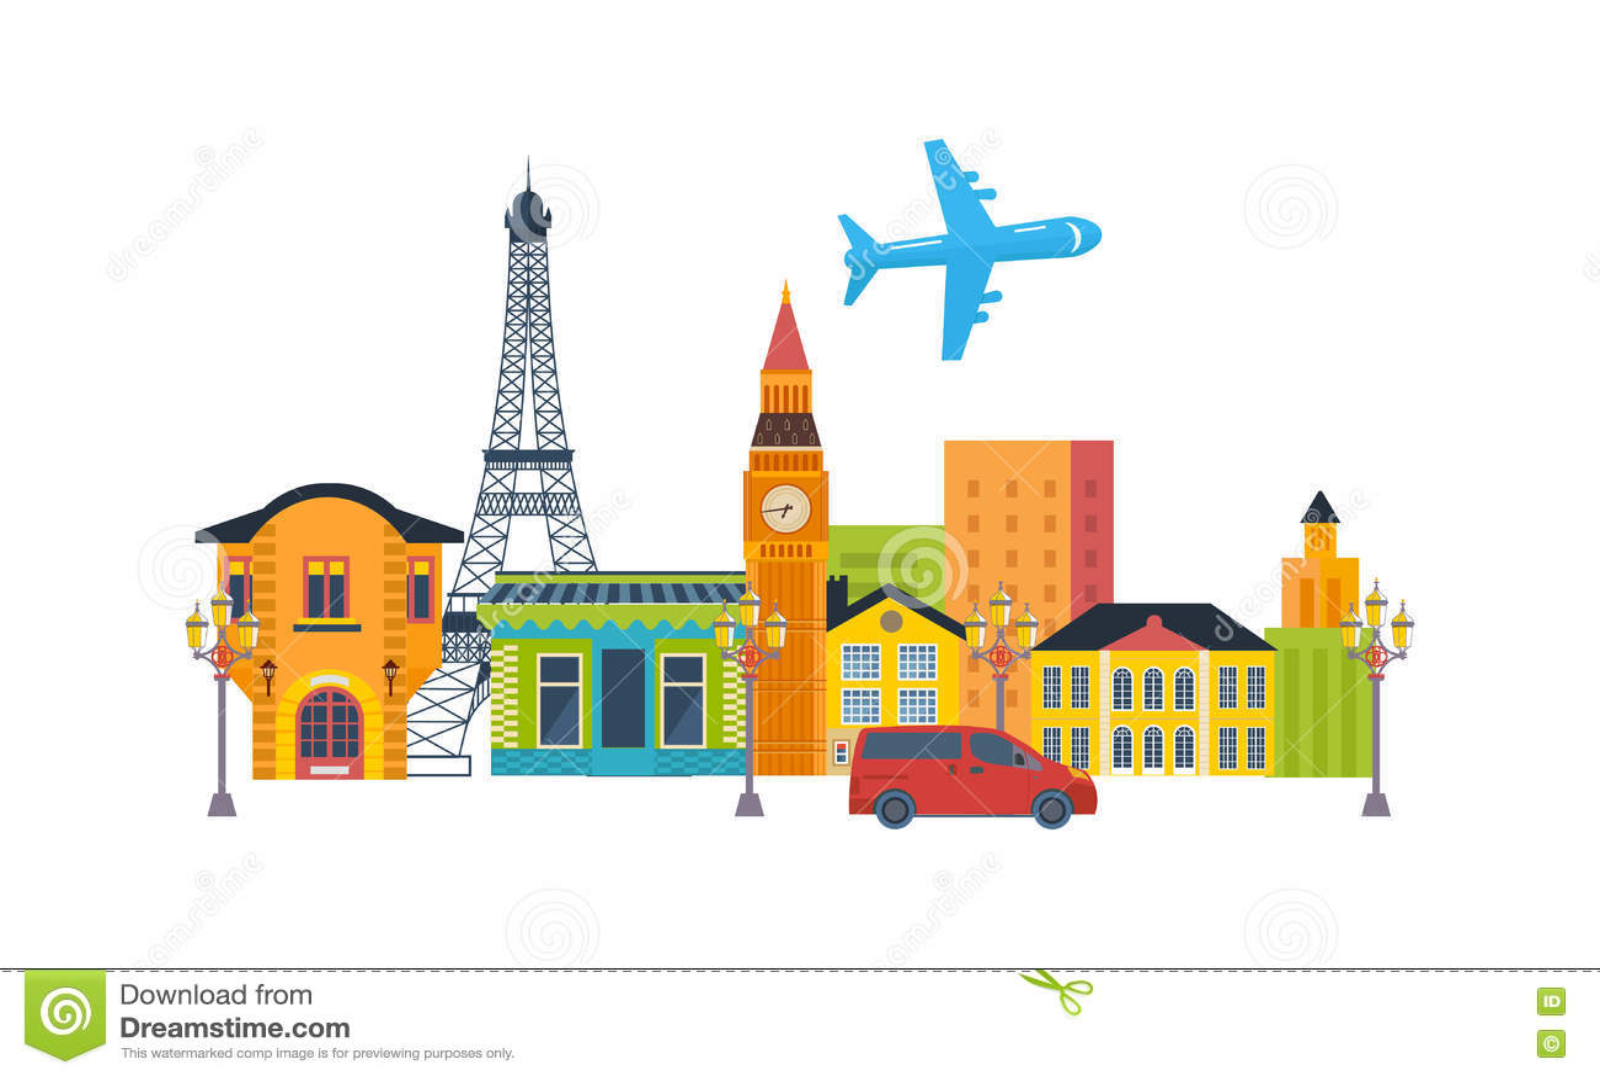 french-landmarks-travel-to-europe-eiffel-tower-france-london-united-kingdom-france-flat-icons-design-concept-73200765.jpg